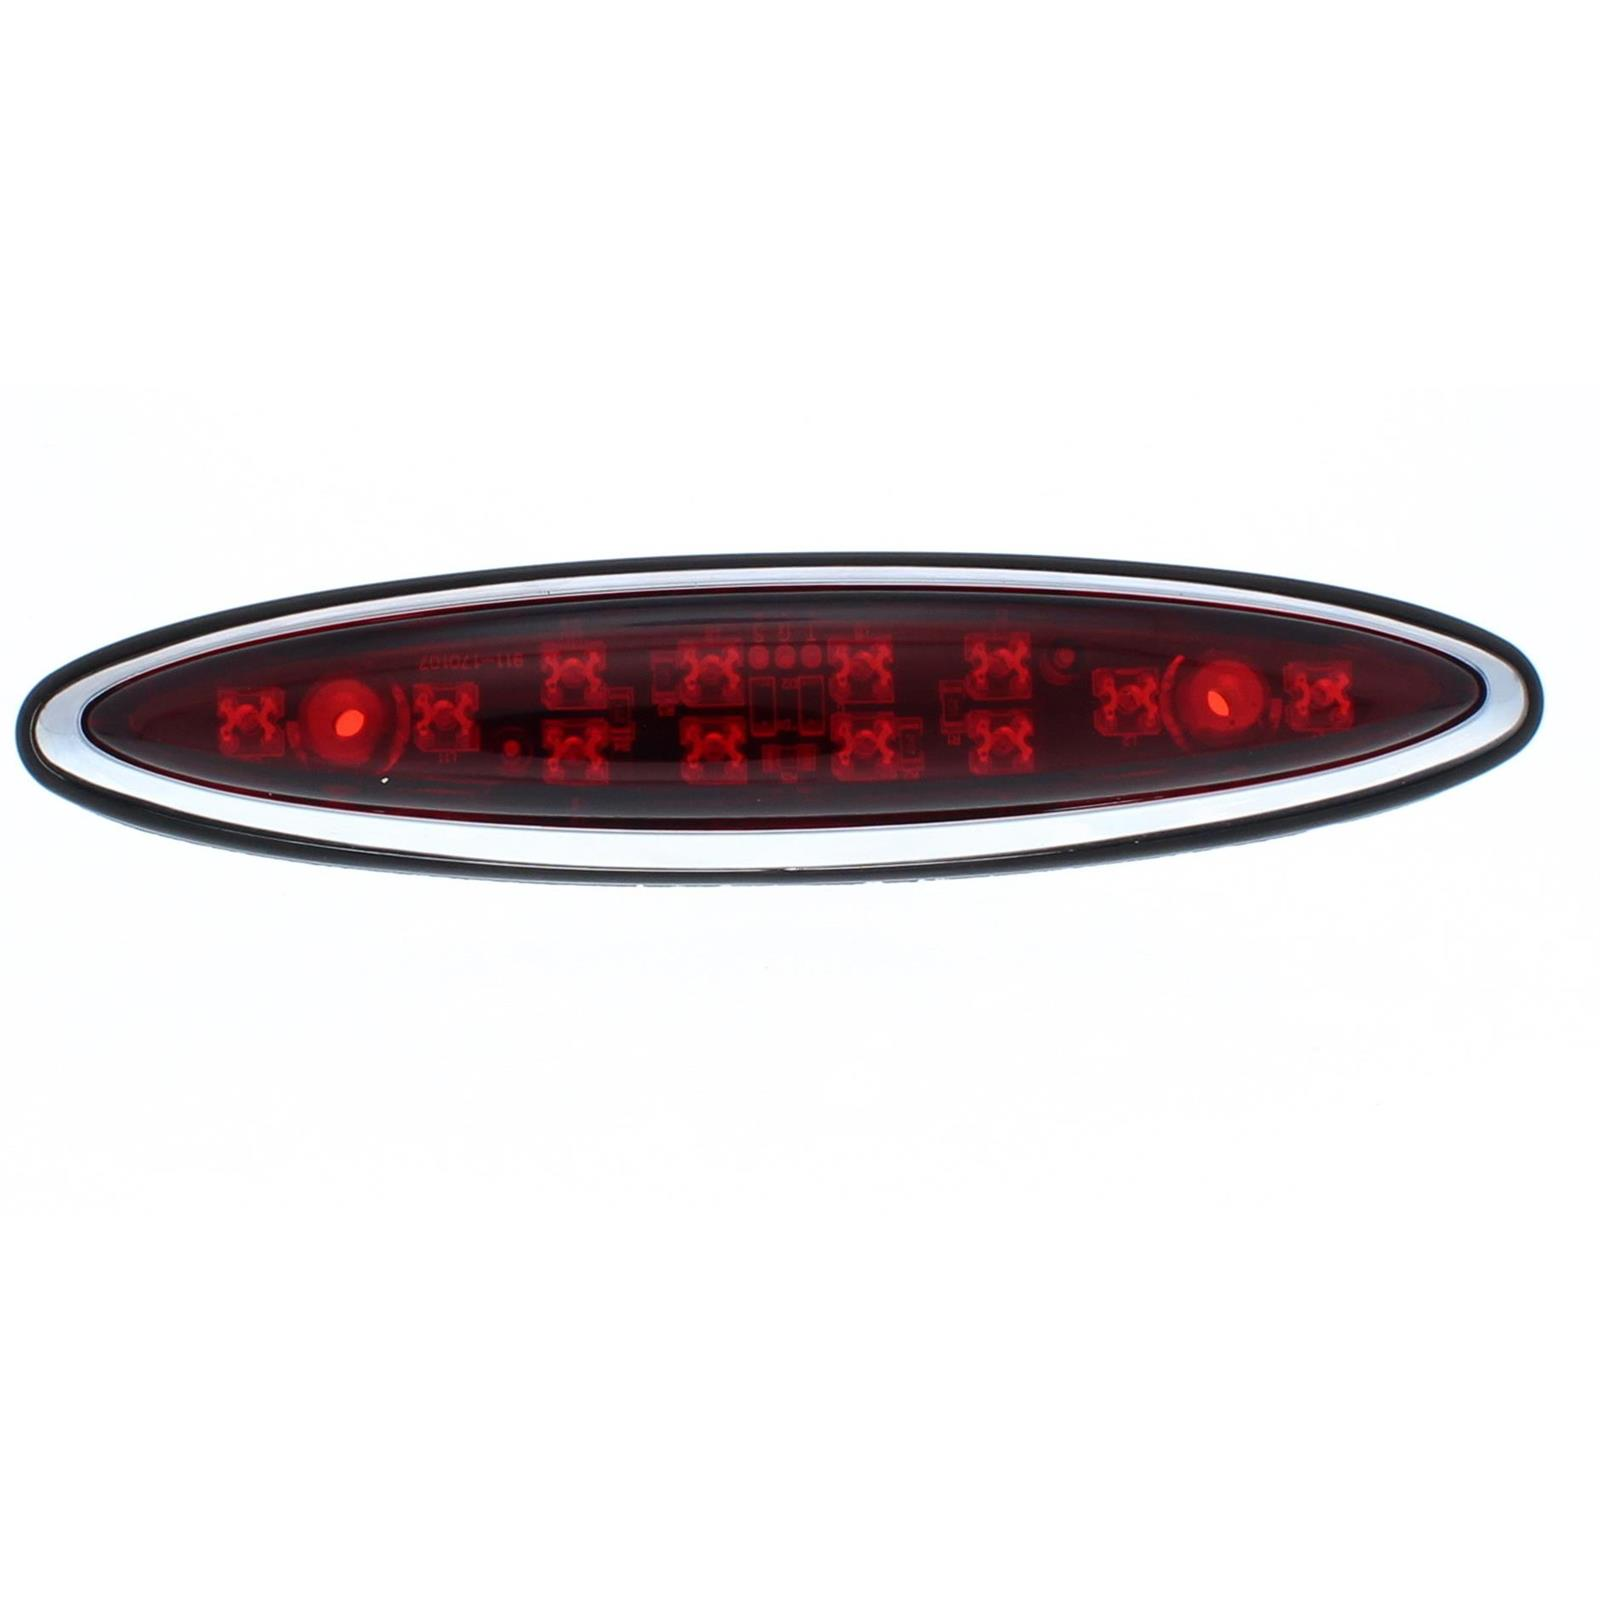 Speedway LED Cat Eye Tail Light